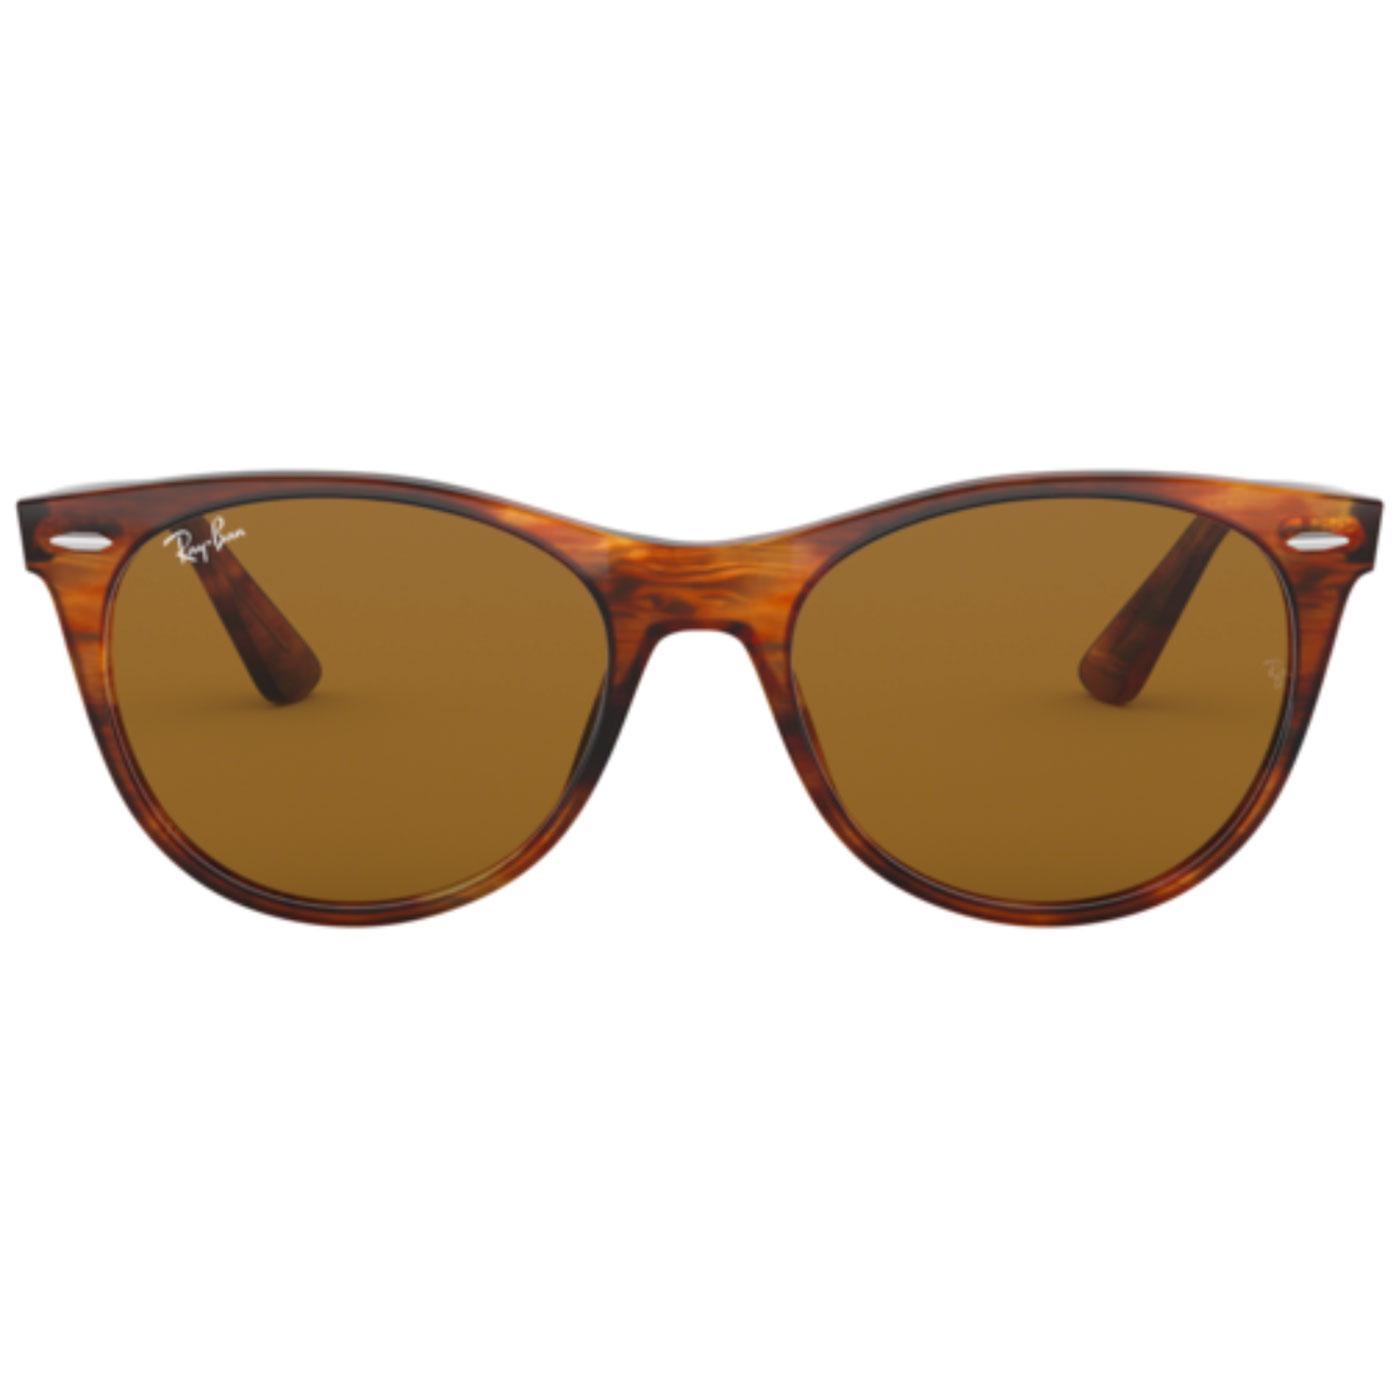 RAY-BAN Retro Striped Havana Wayfarer Sunglasses